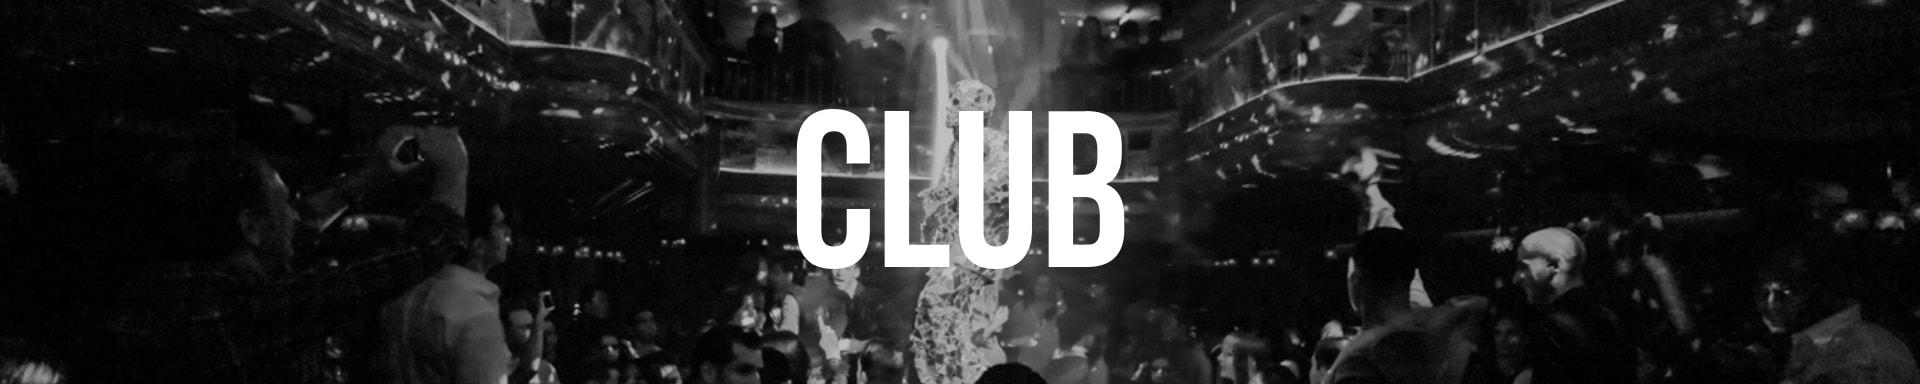 Club Attire